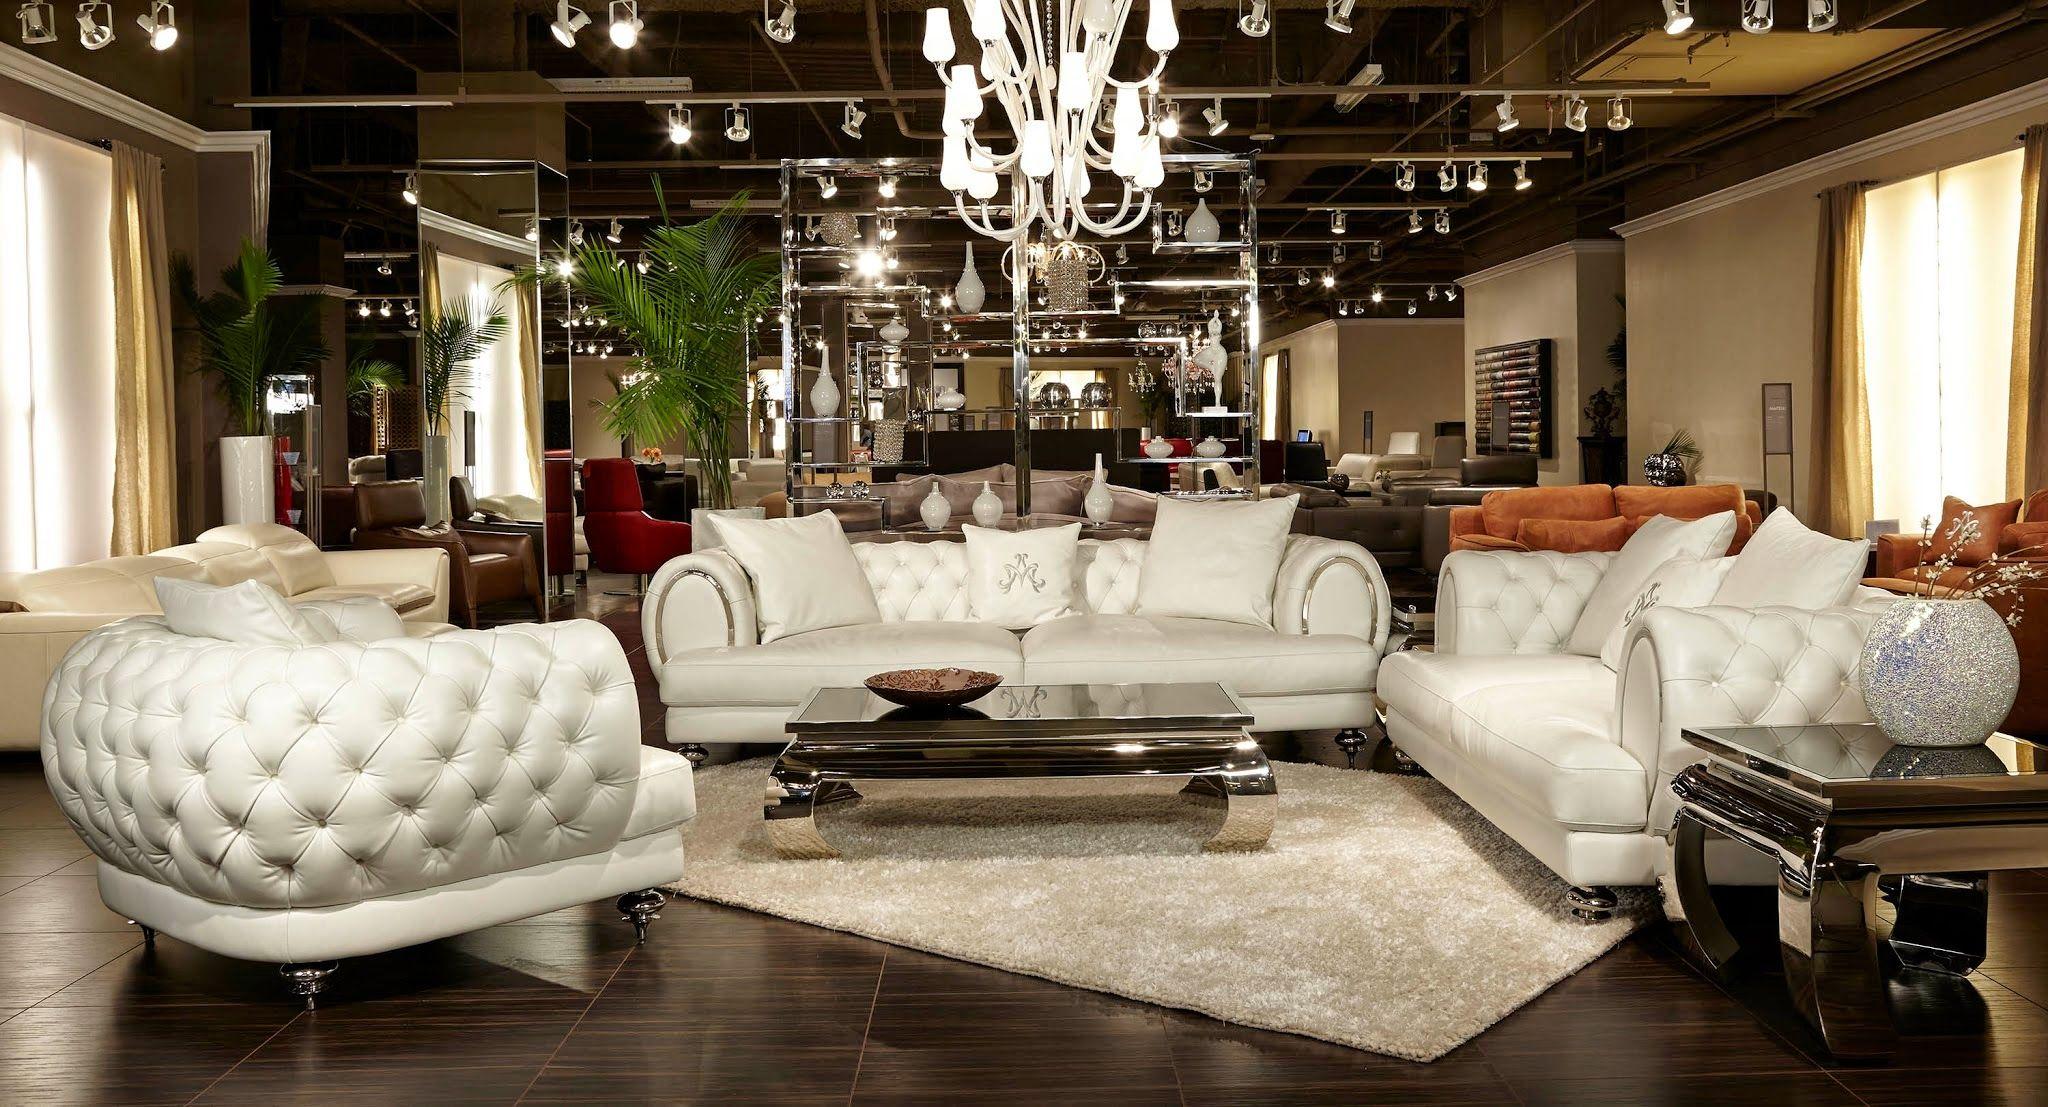 Fabulous Formal Living Room Furniture Design In Luxury White